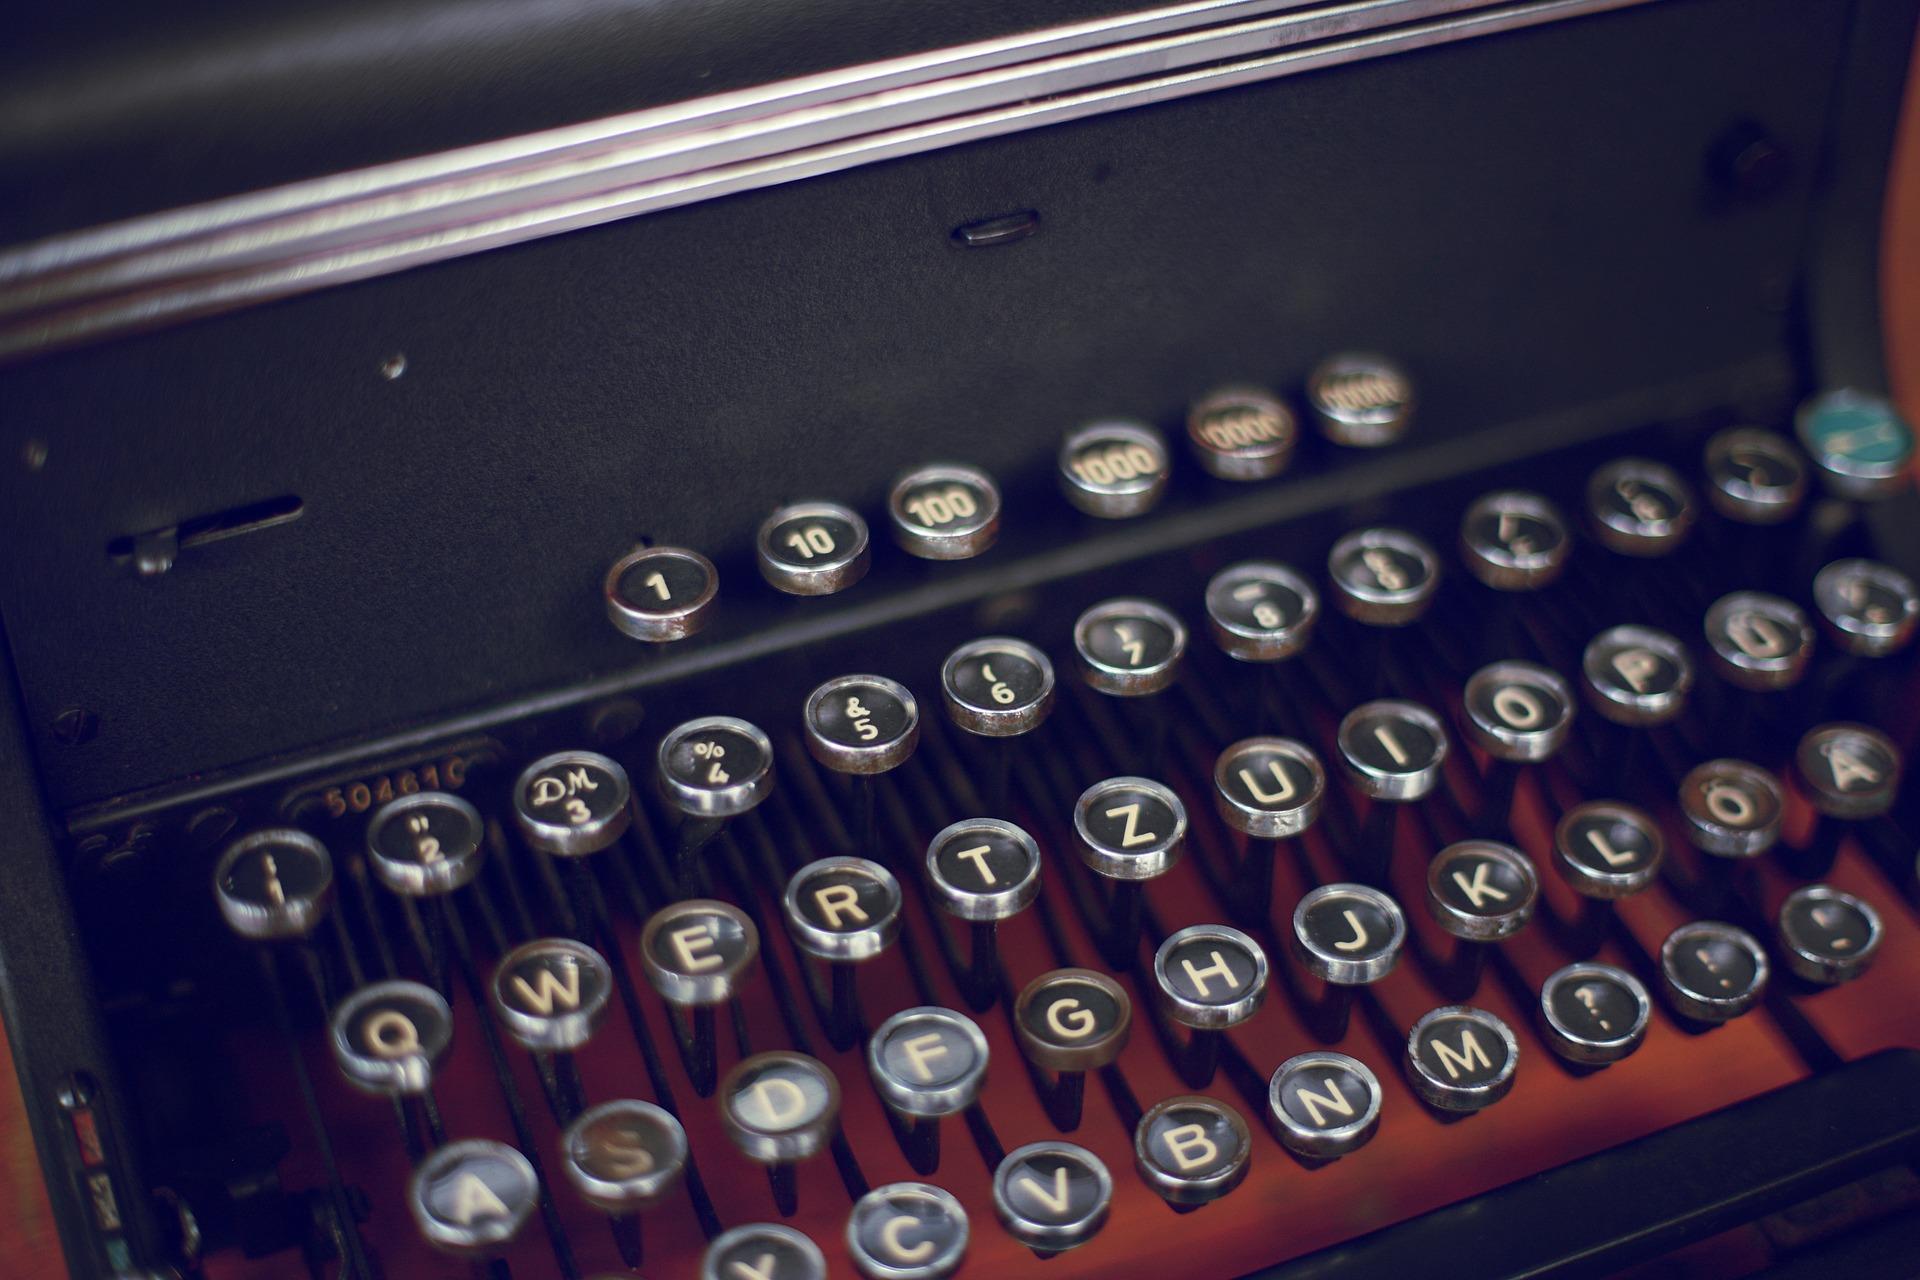 https://s3.us-east-2.amazonaws.com/withjamesbarr/genres/typewriter.jpg